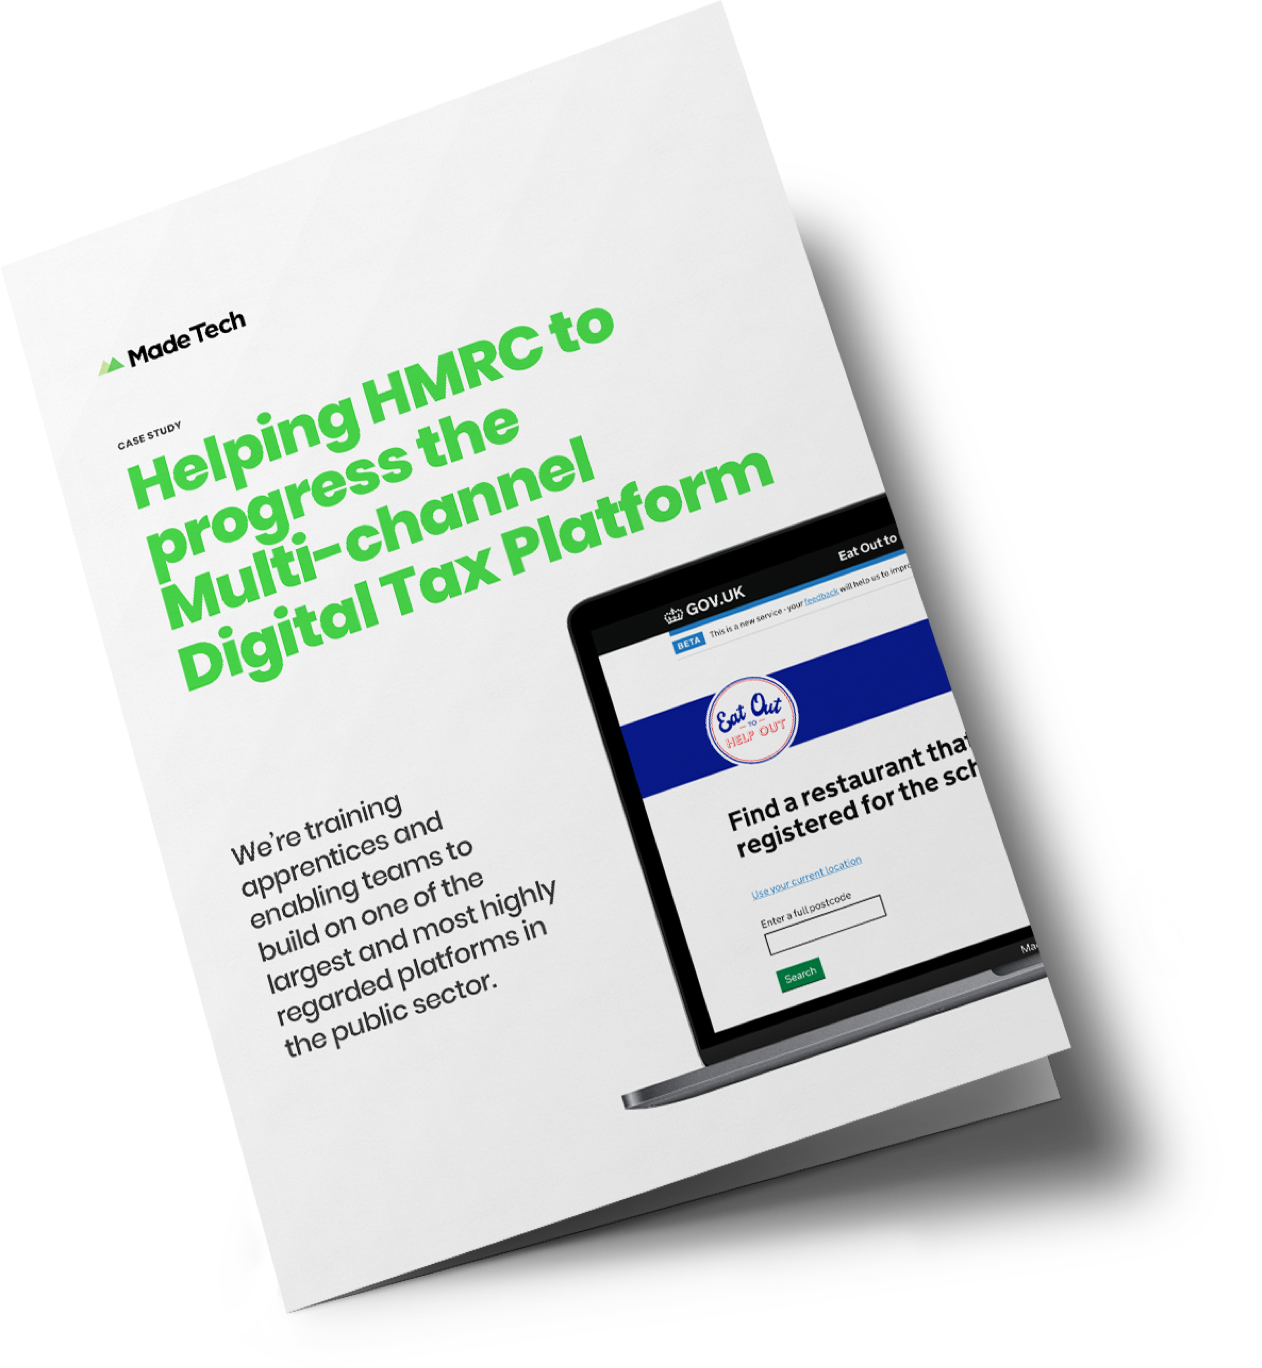 Helping HMRC to progress the Multi-channel Digital Tax Platform case study cover